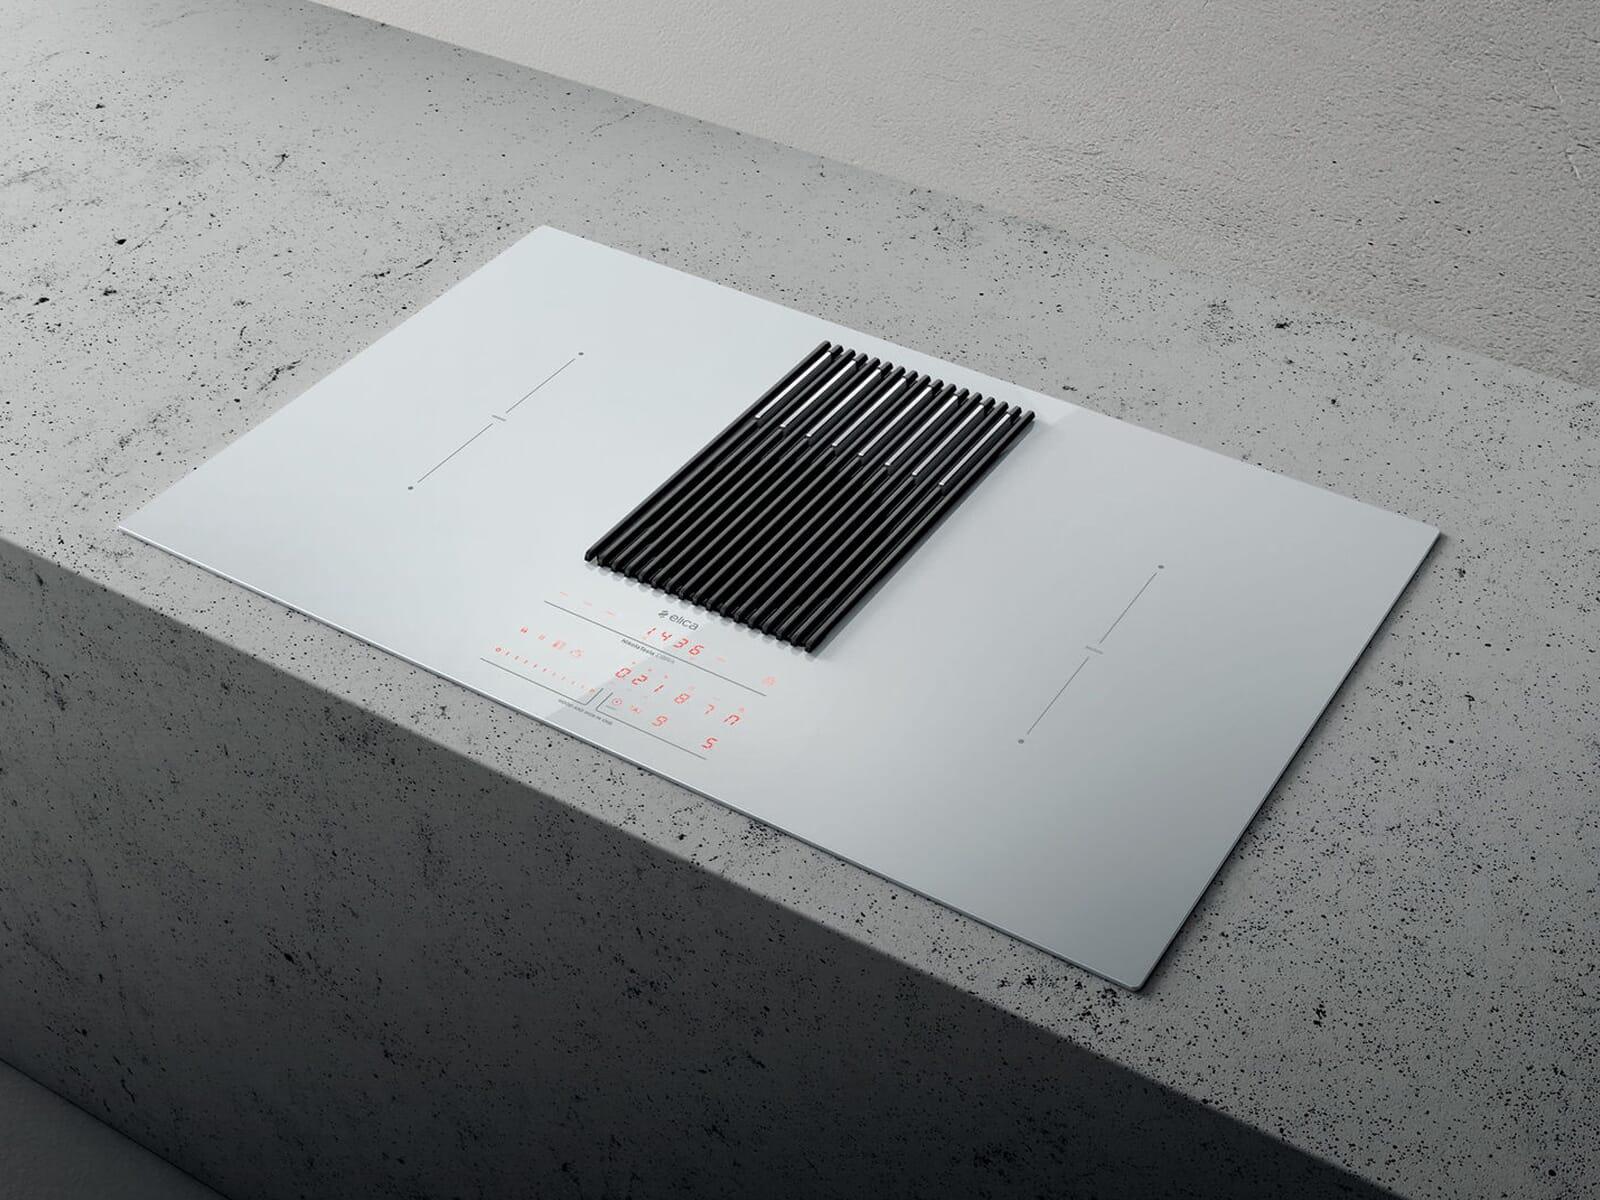 Elica NikolaTesla Libra PRF0147774 Induktionskochfeld-Dunstabzug-Kombination Weiß mit integrierter Waage